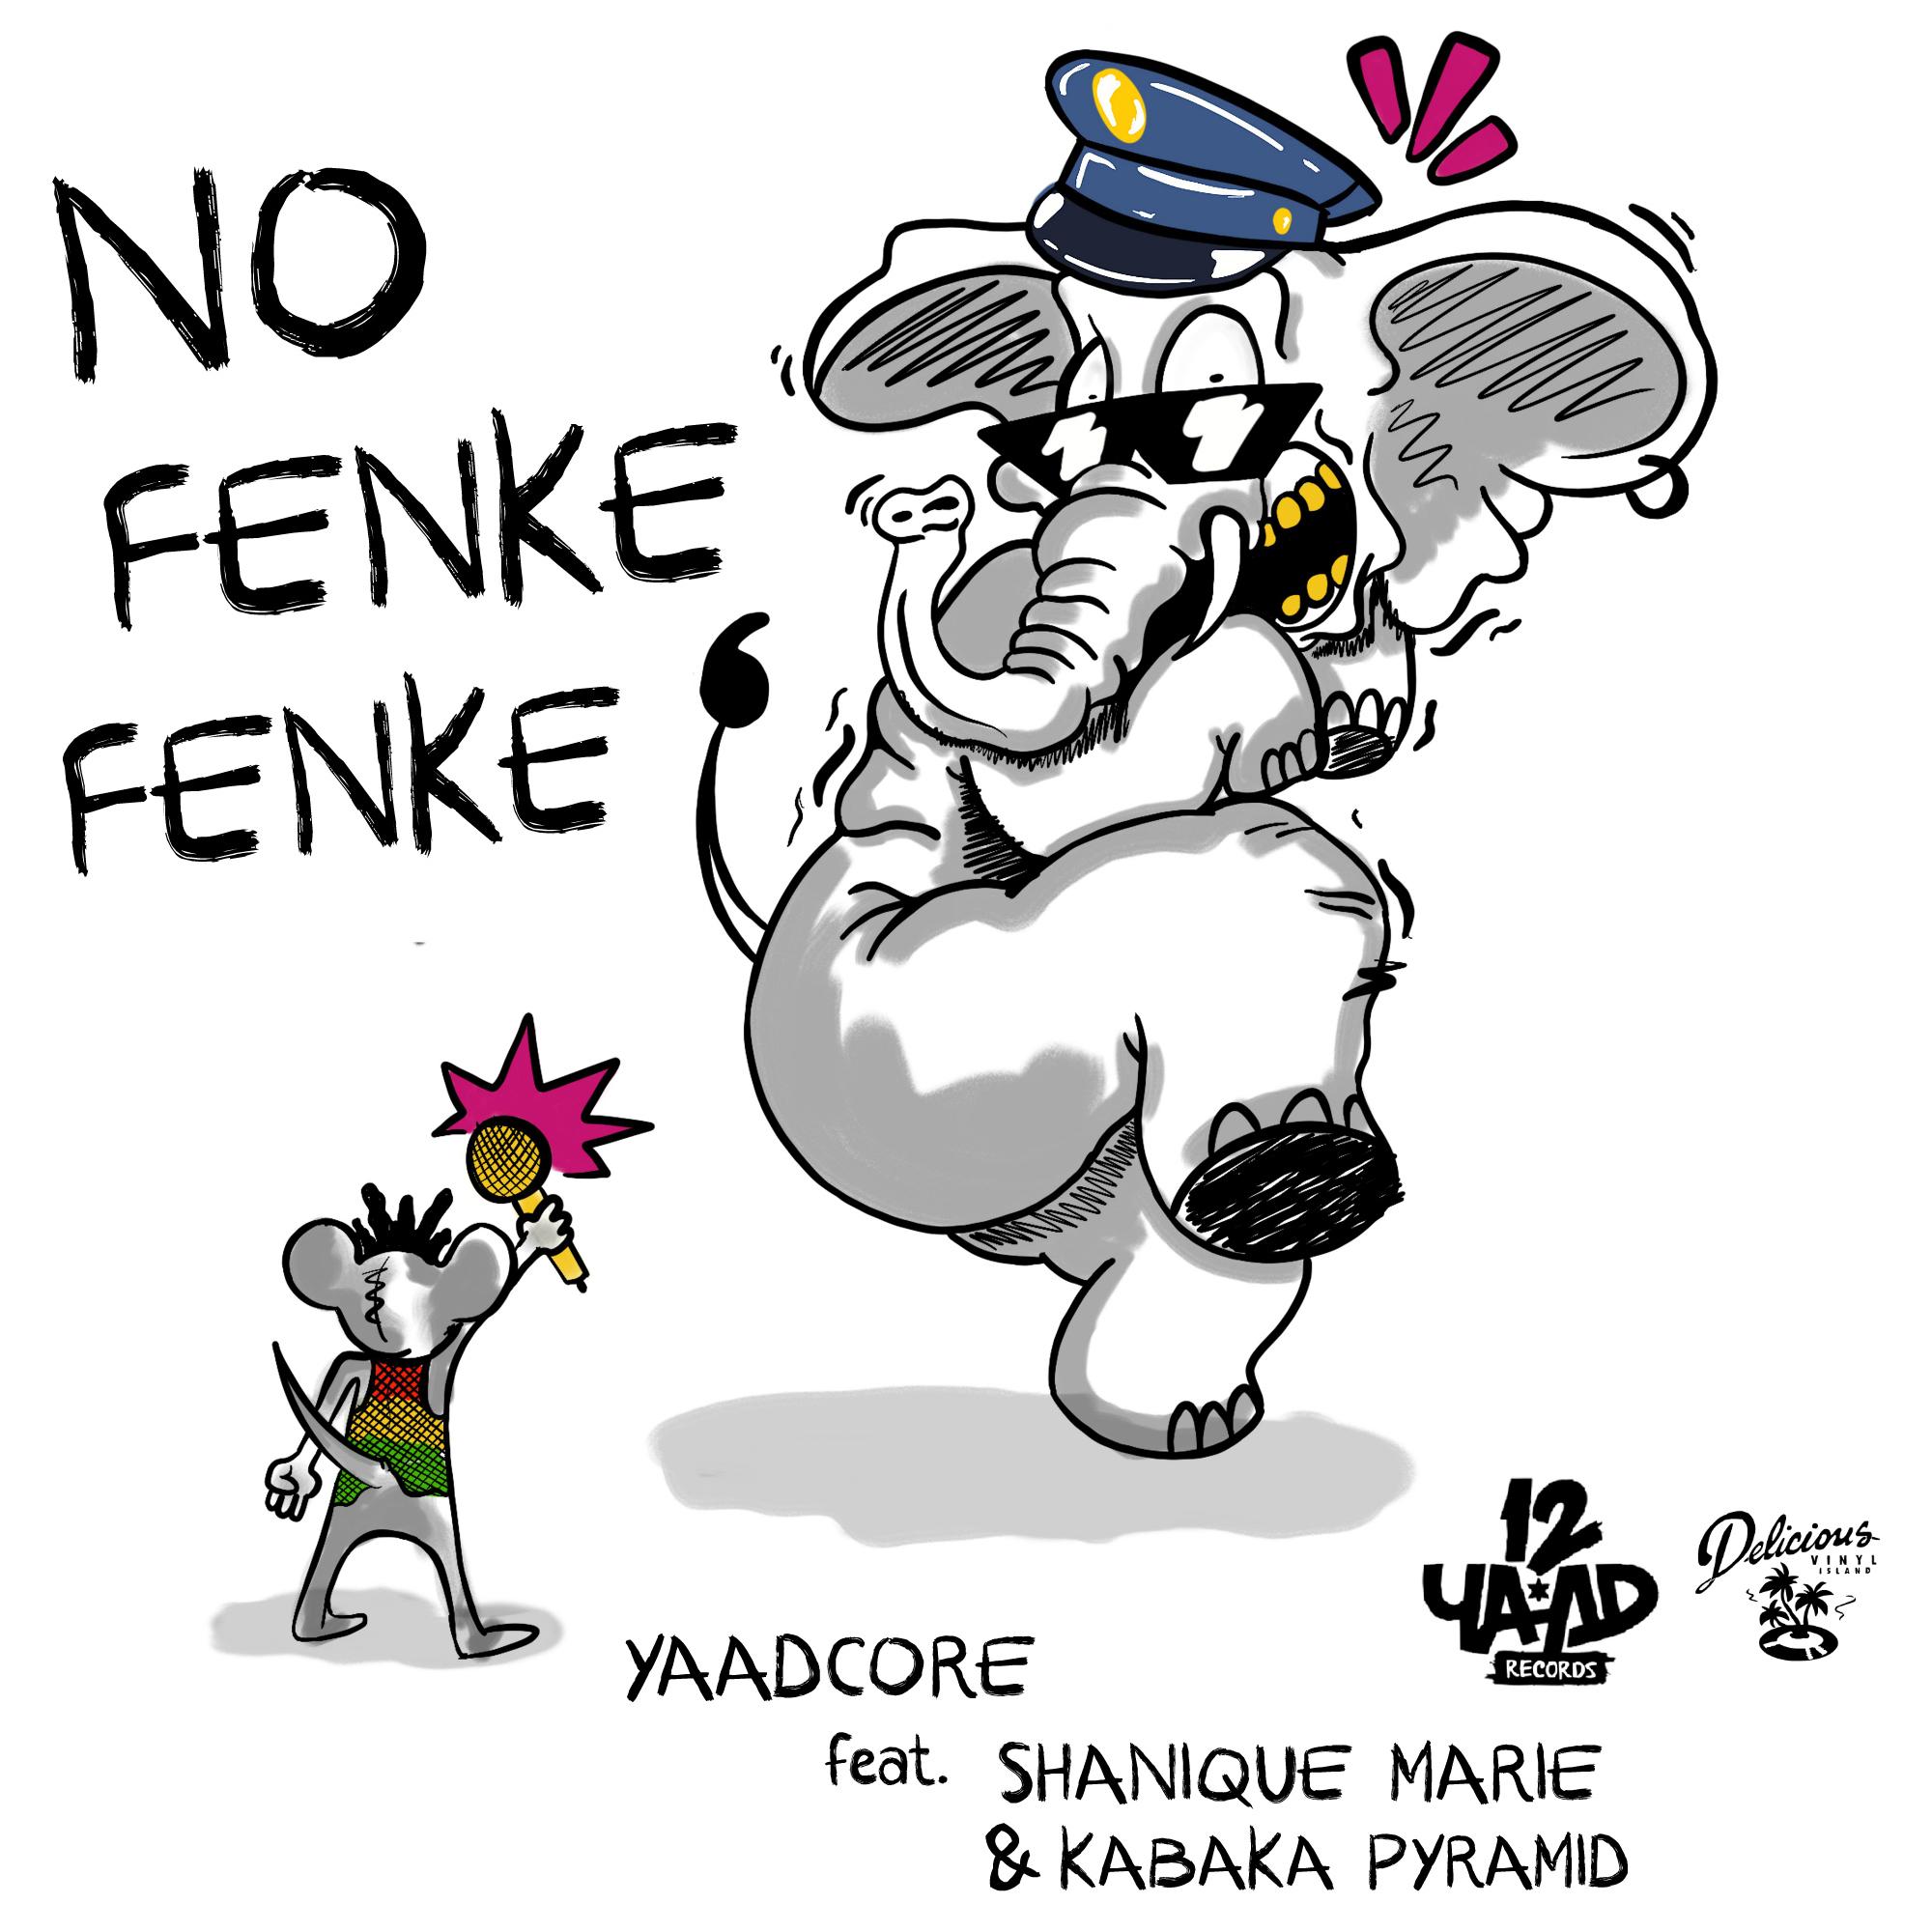 Yaadcore No Fenke Fenke